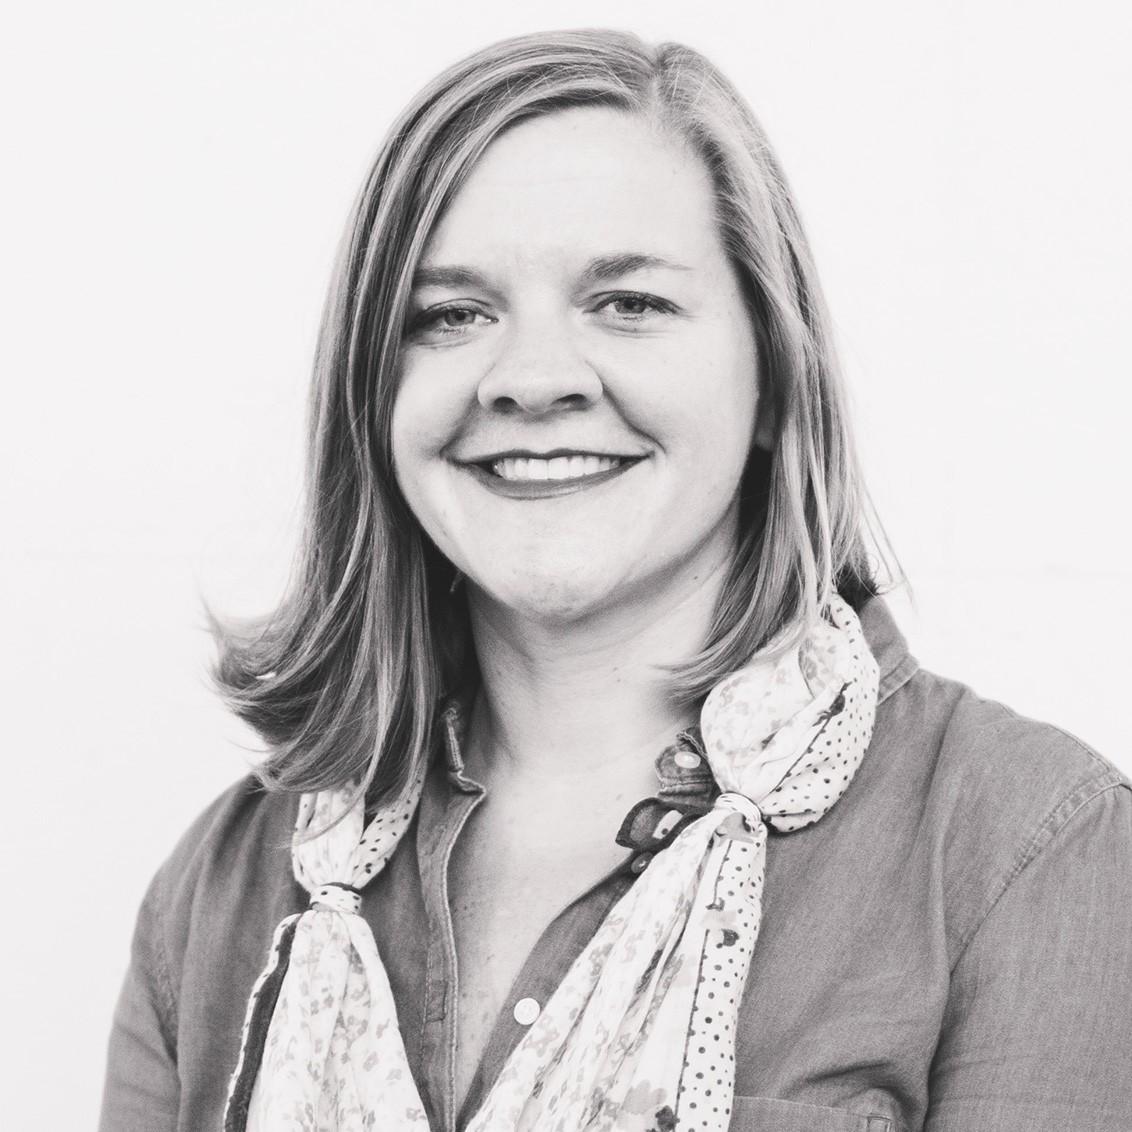 Black and white portrait of Heather Ligler